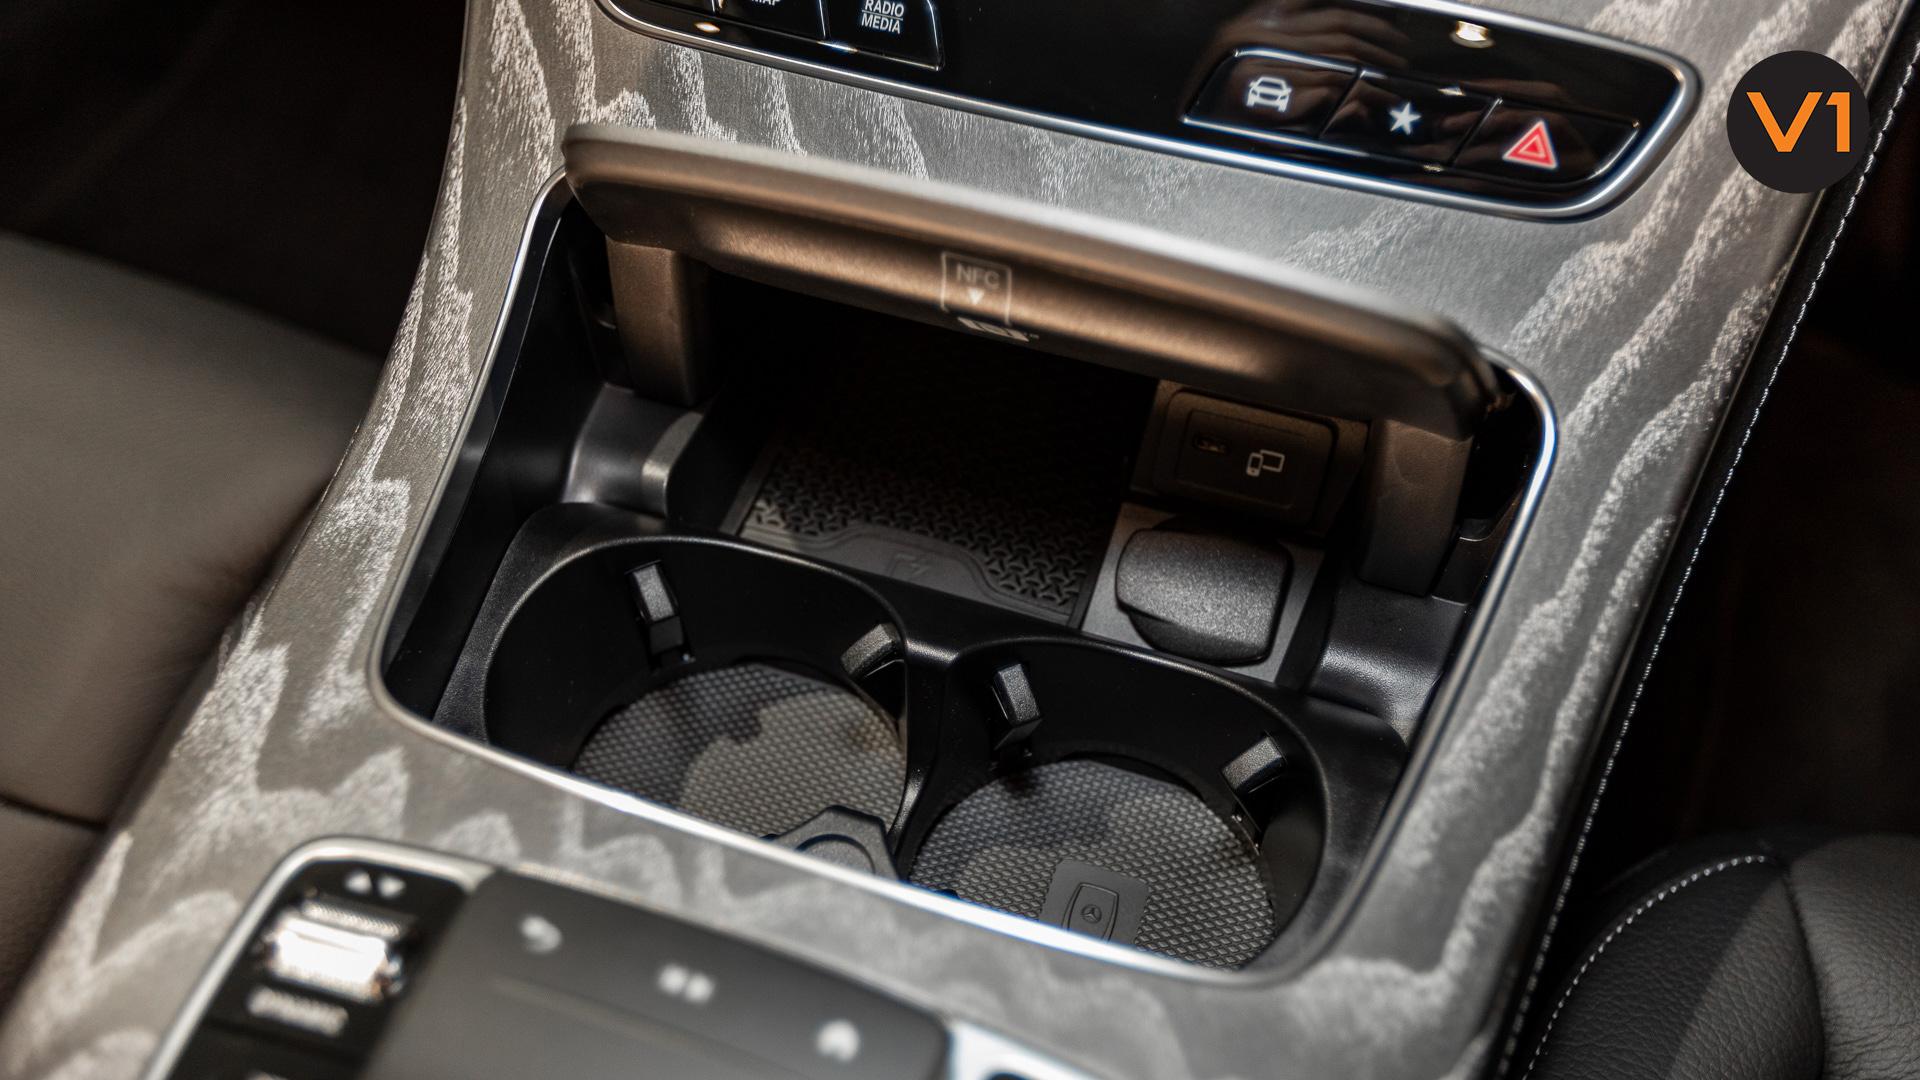 Mercedes-Benz E220d Saloon AMG Line Night Edition Premium Plus (FL2021) - Cupholder